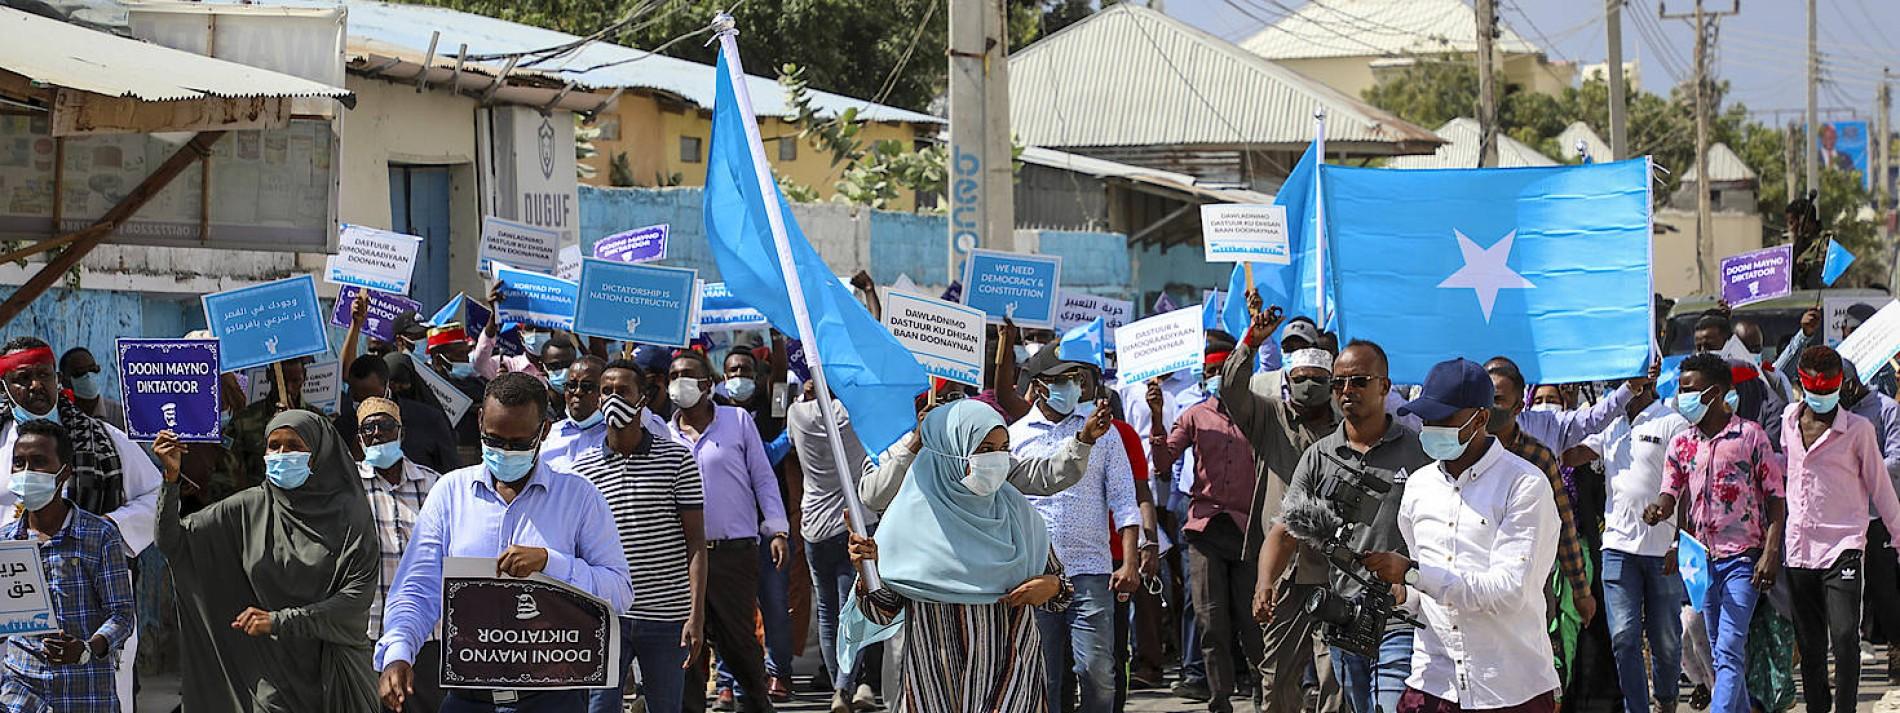 Gefechte in Somalias Hauptstadt Mogadischu